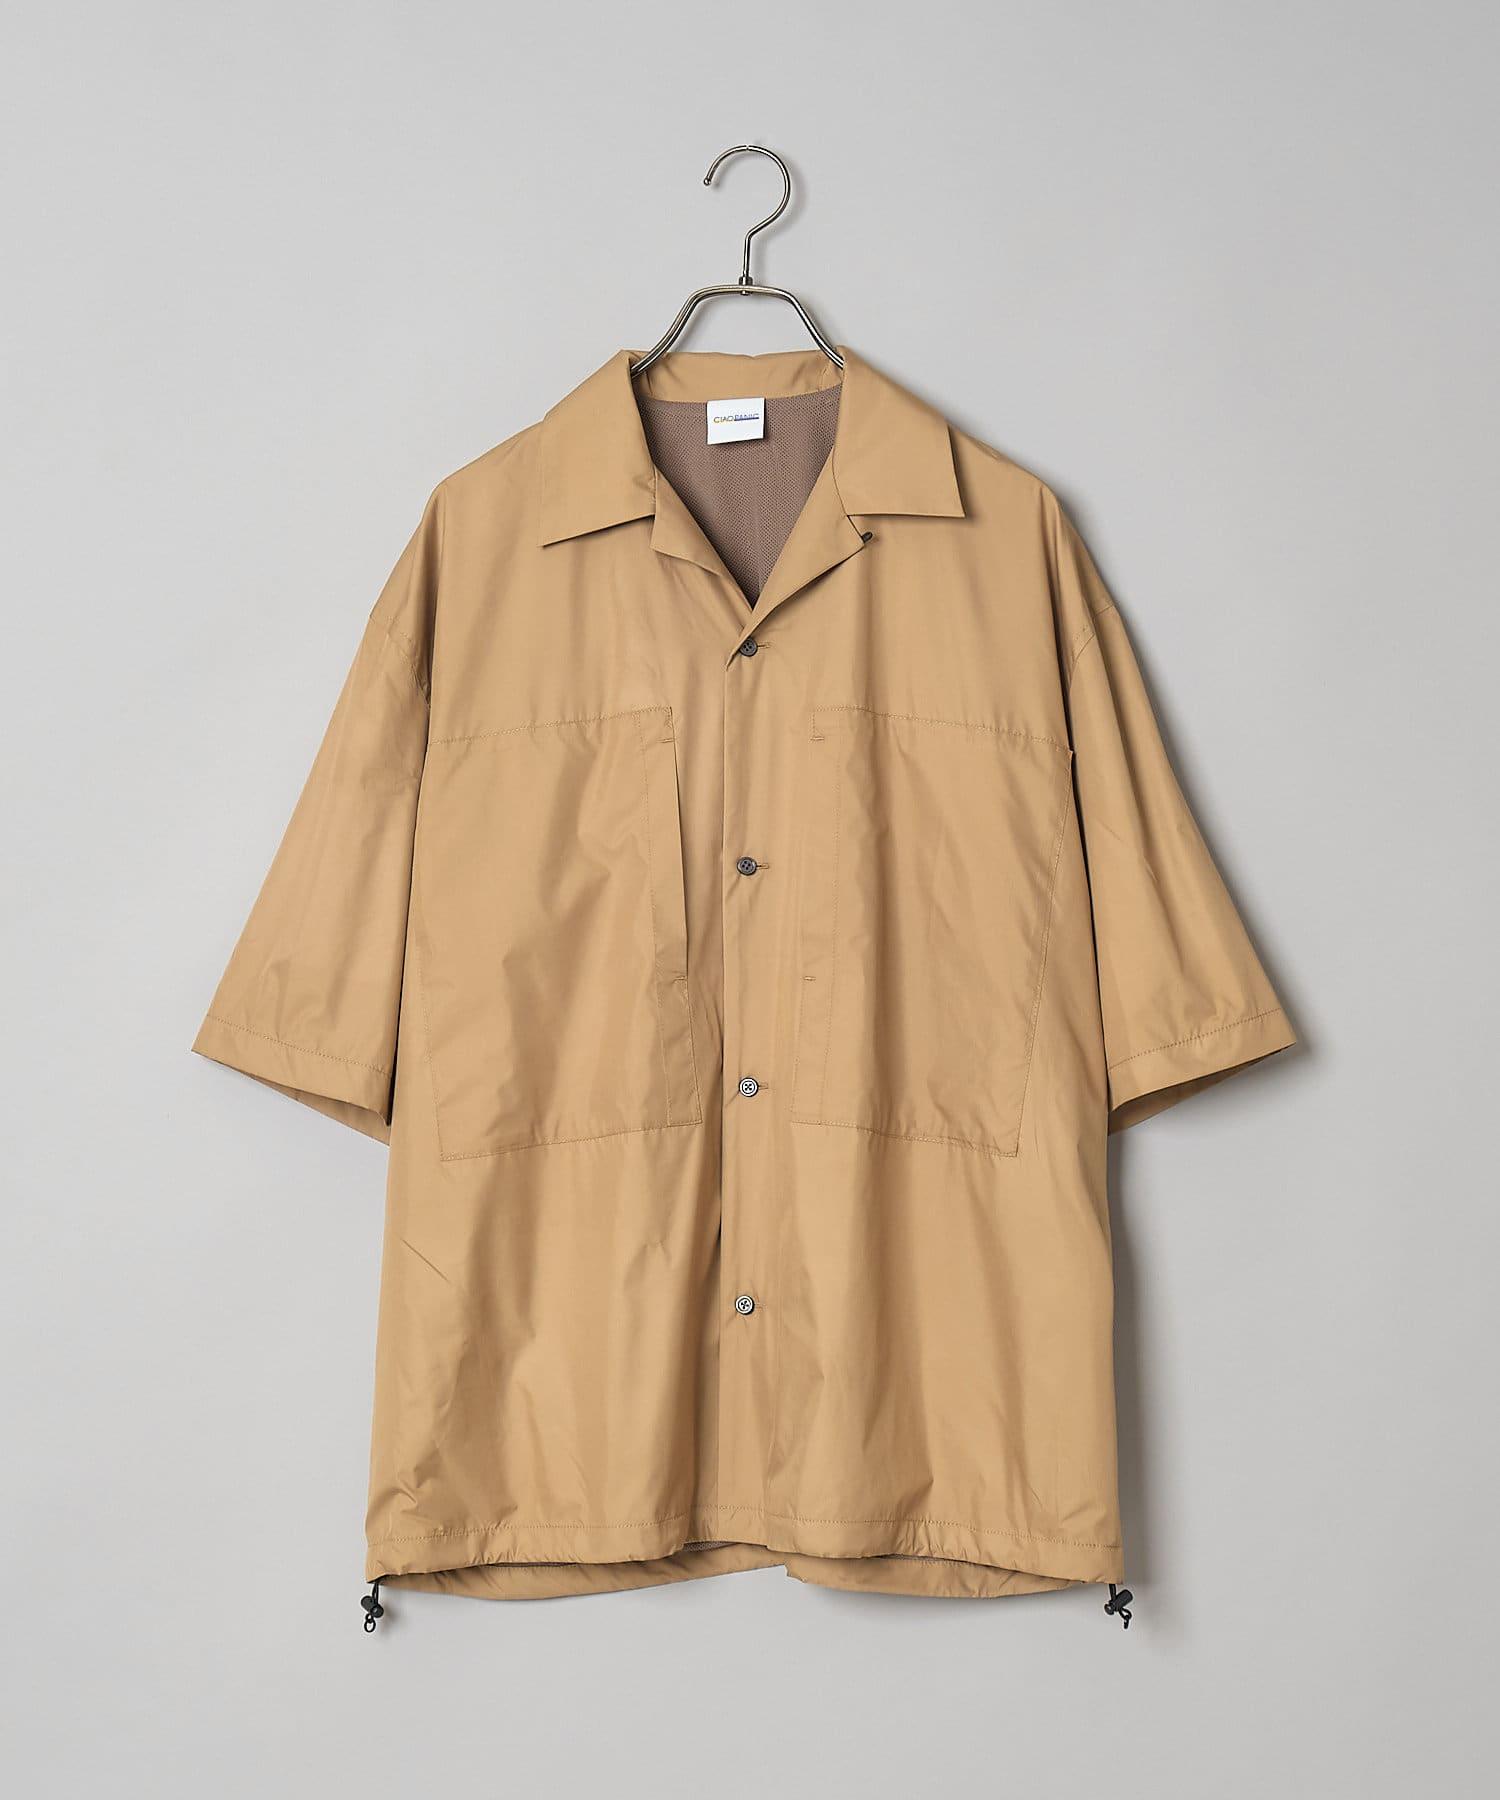 CIAOPANIC(チャオパニック) ナイロンオープンカラービッグシャツブルゾン